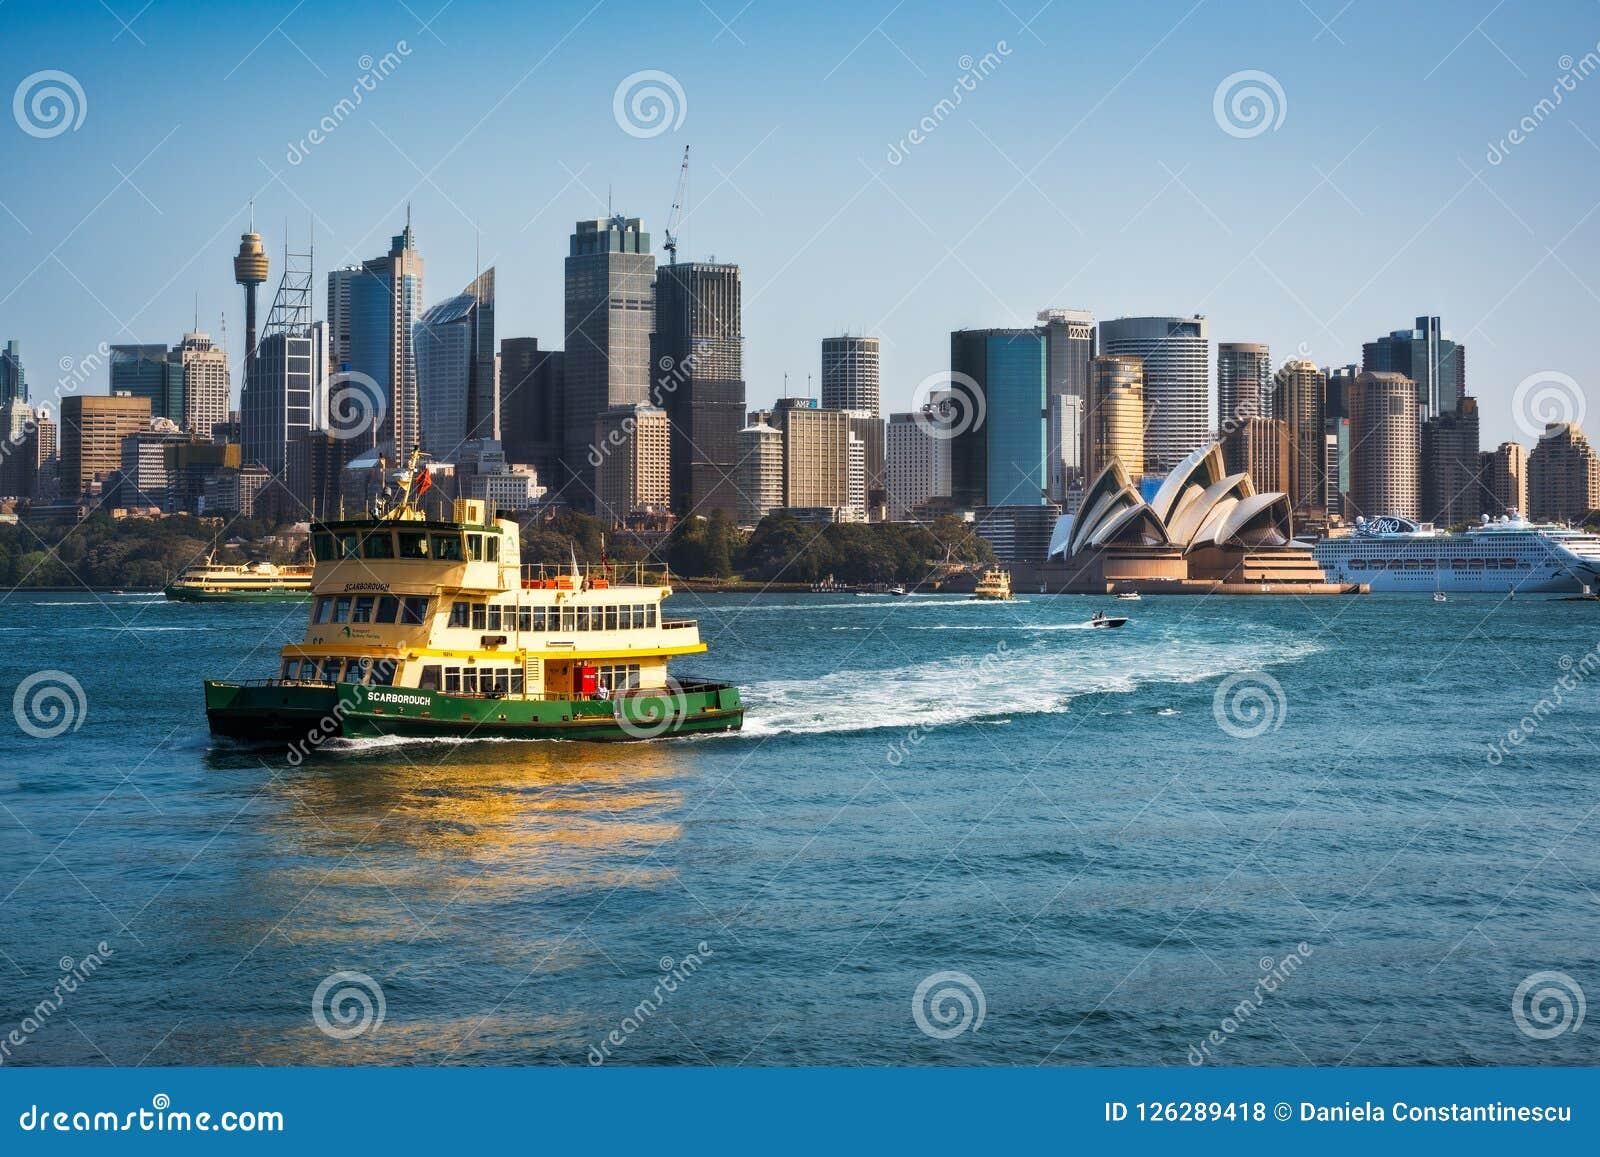 A Ferryboat in Sydney Harbour, Australia.